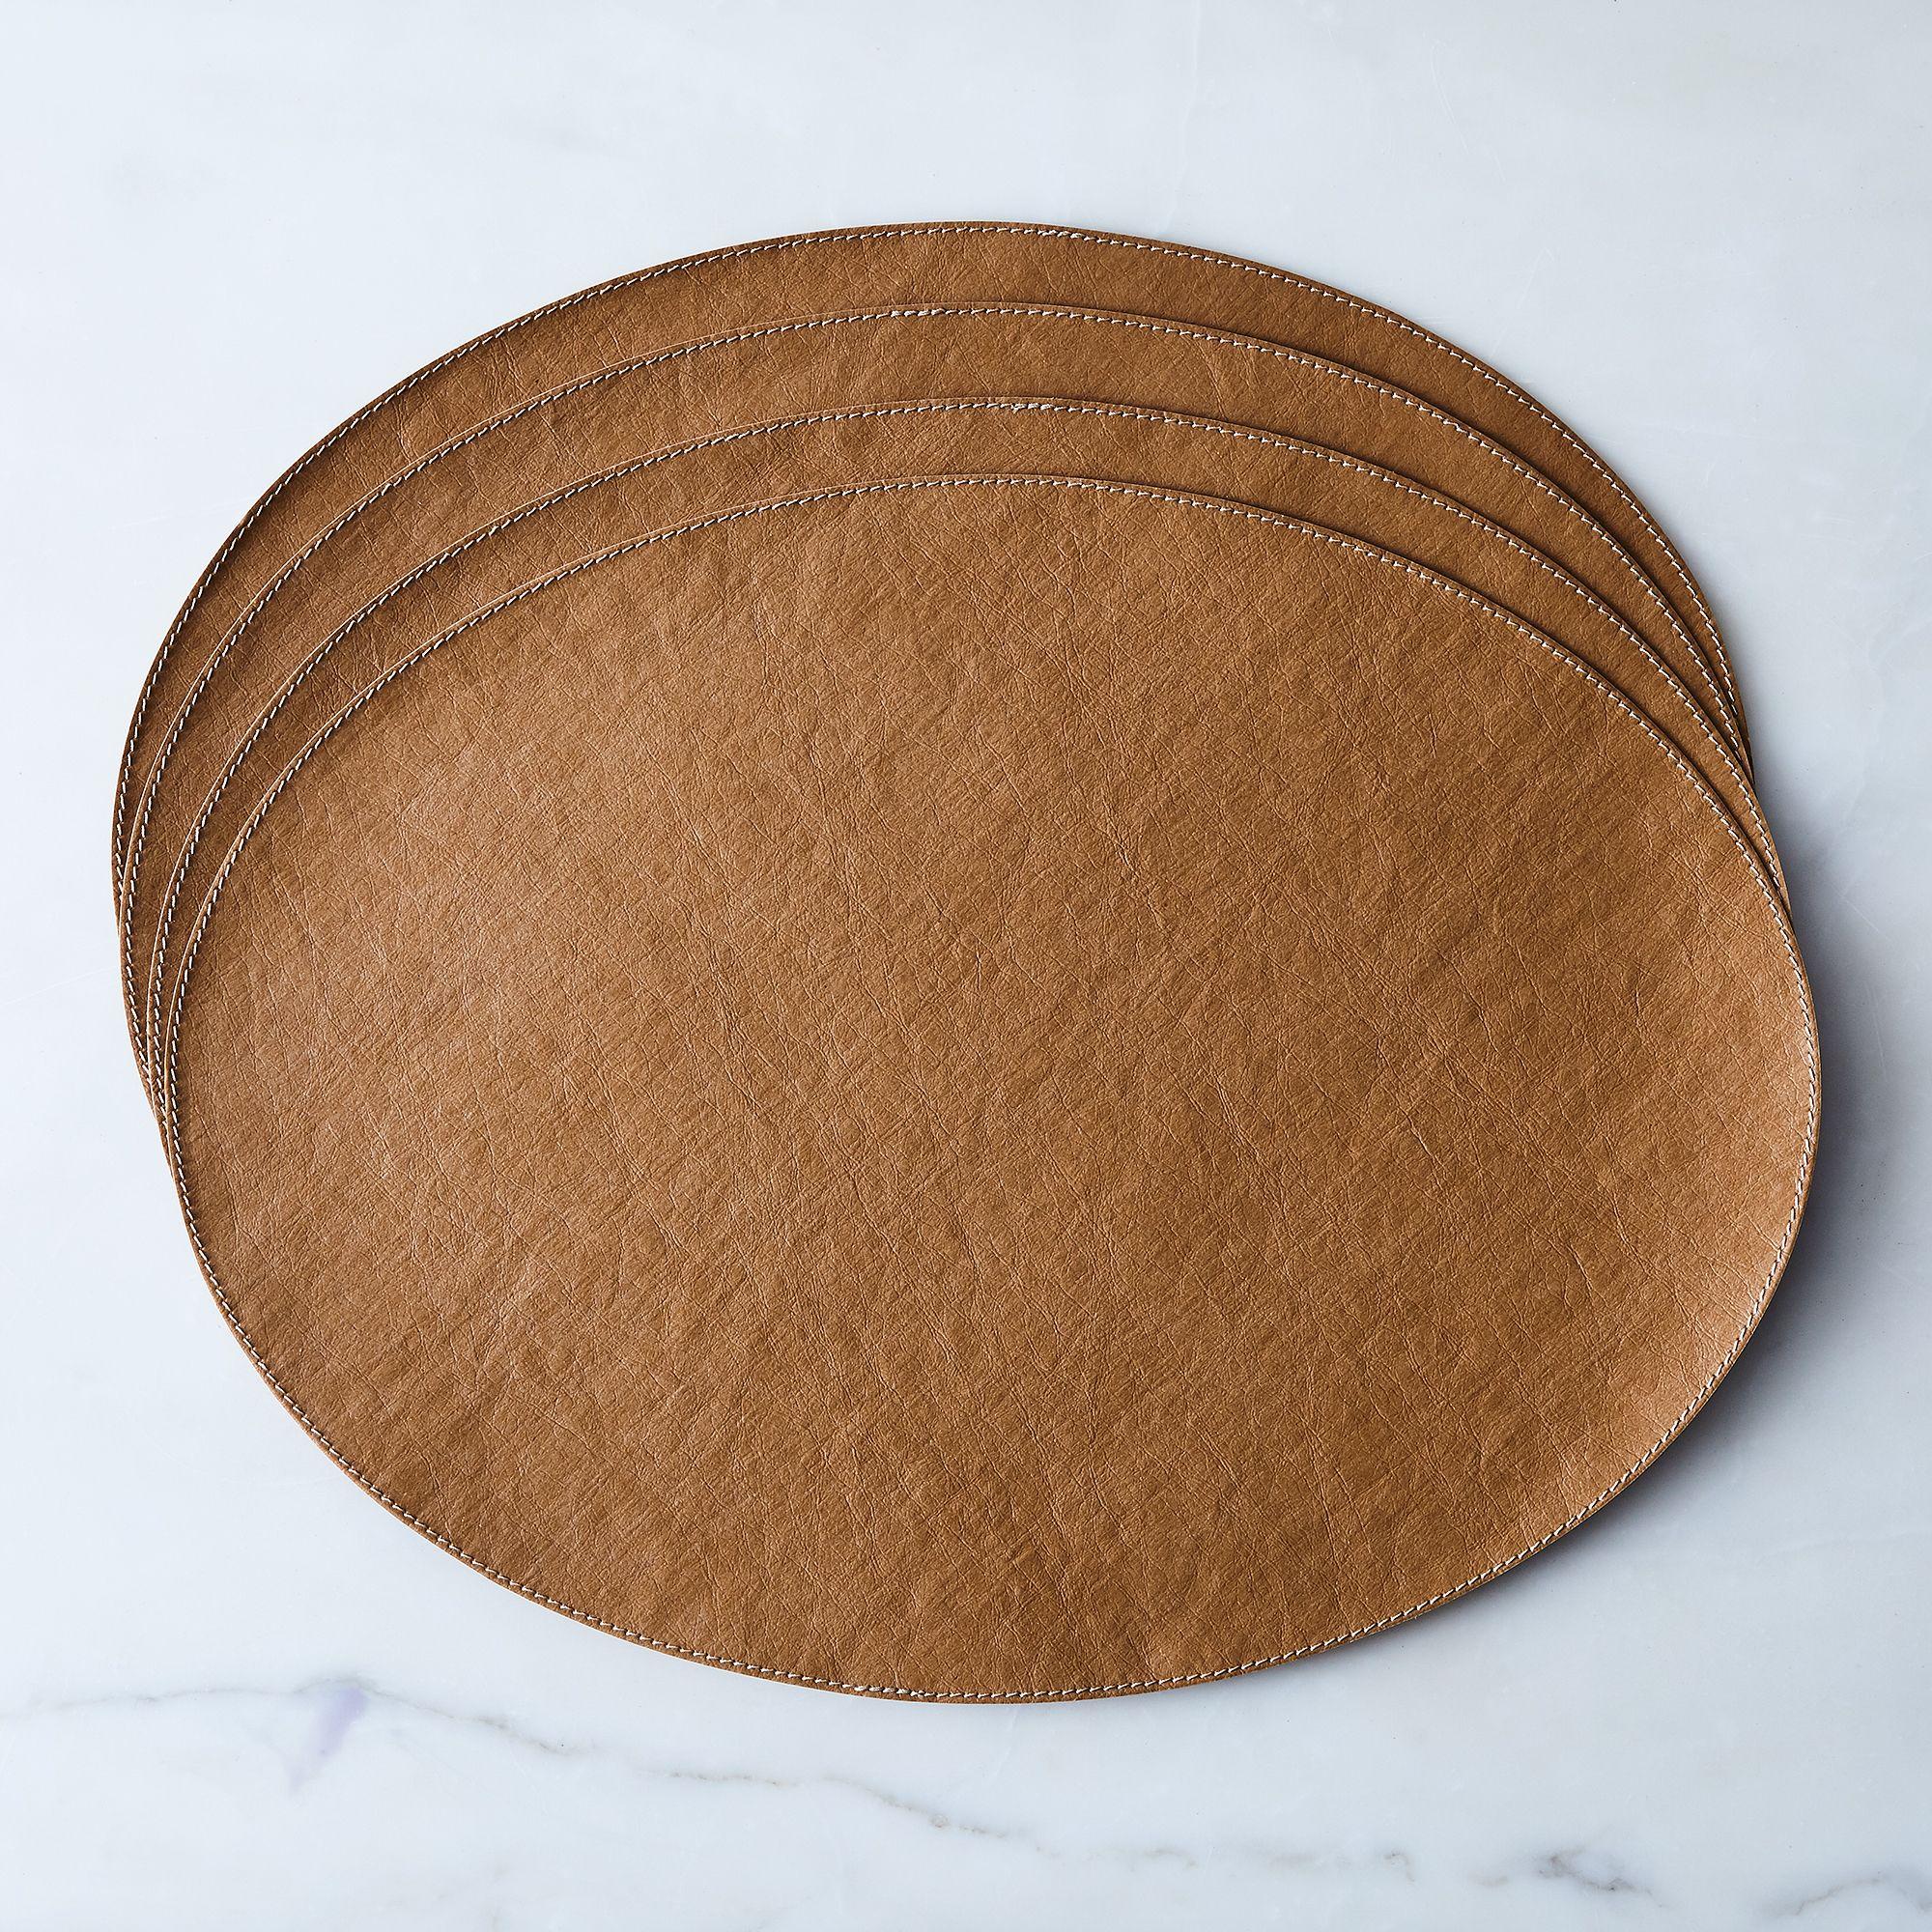 F0ac22a8 59ae 4b80 8846 c58bcba41715  2017 0620 uashmama placemats oval set of 4 brown avana silo rocky luten 005